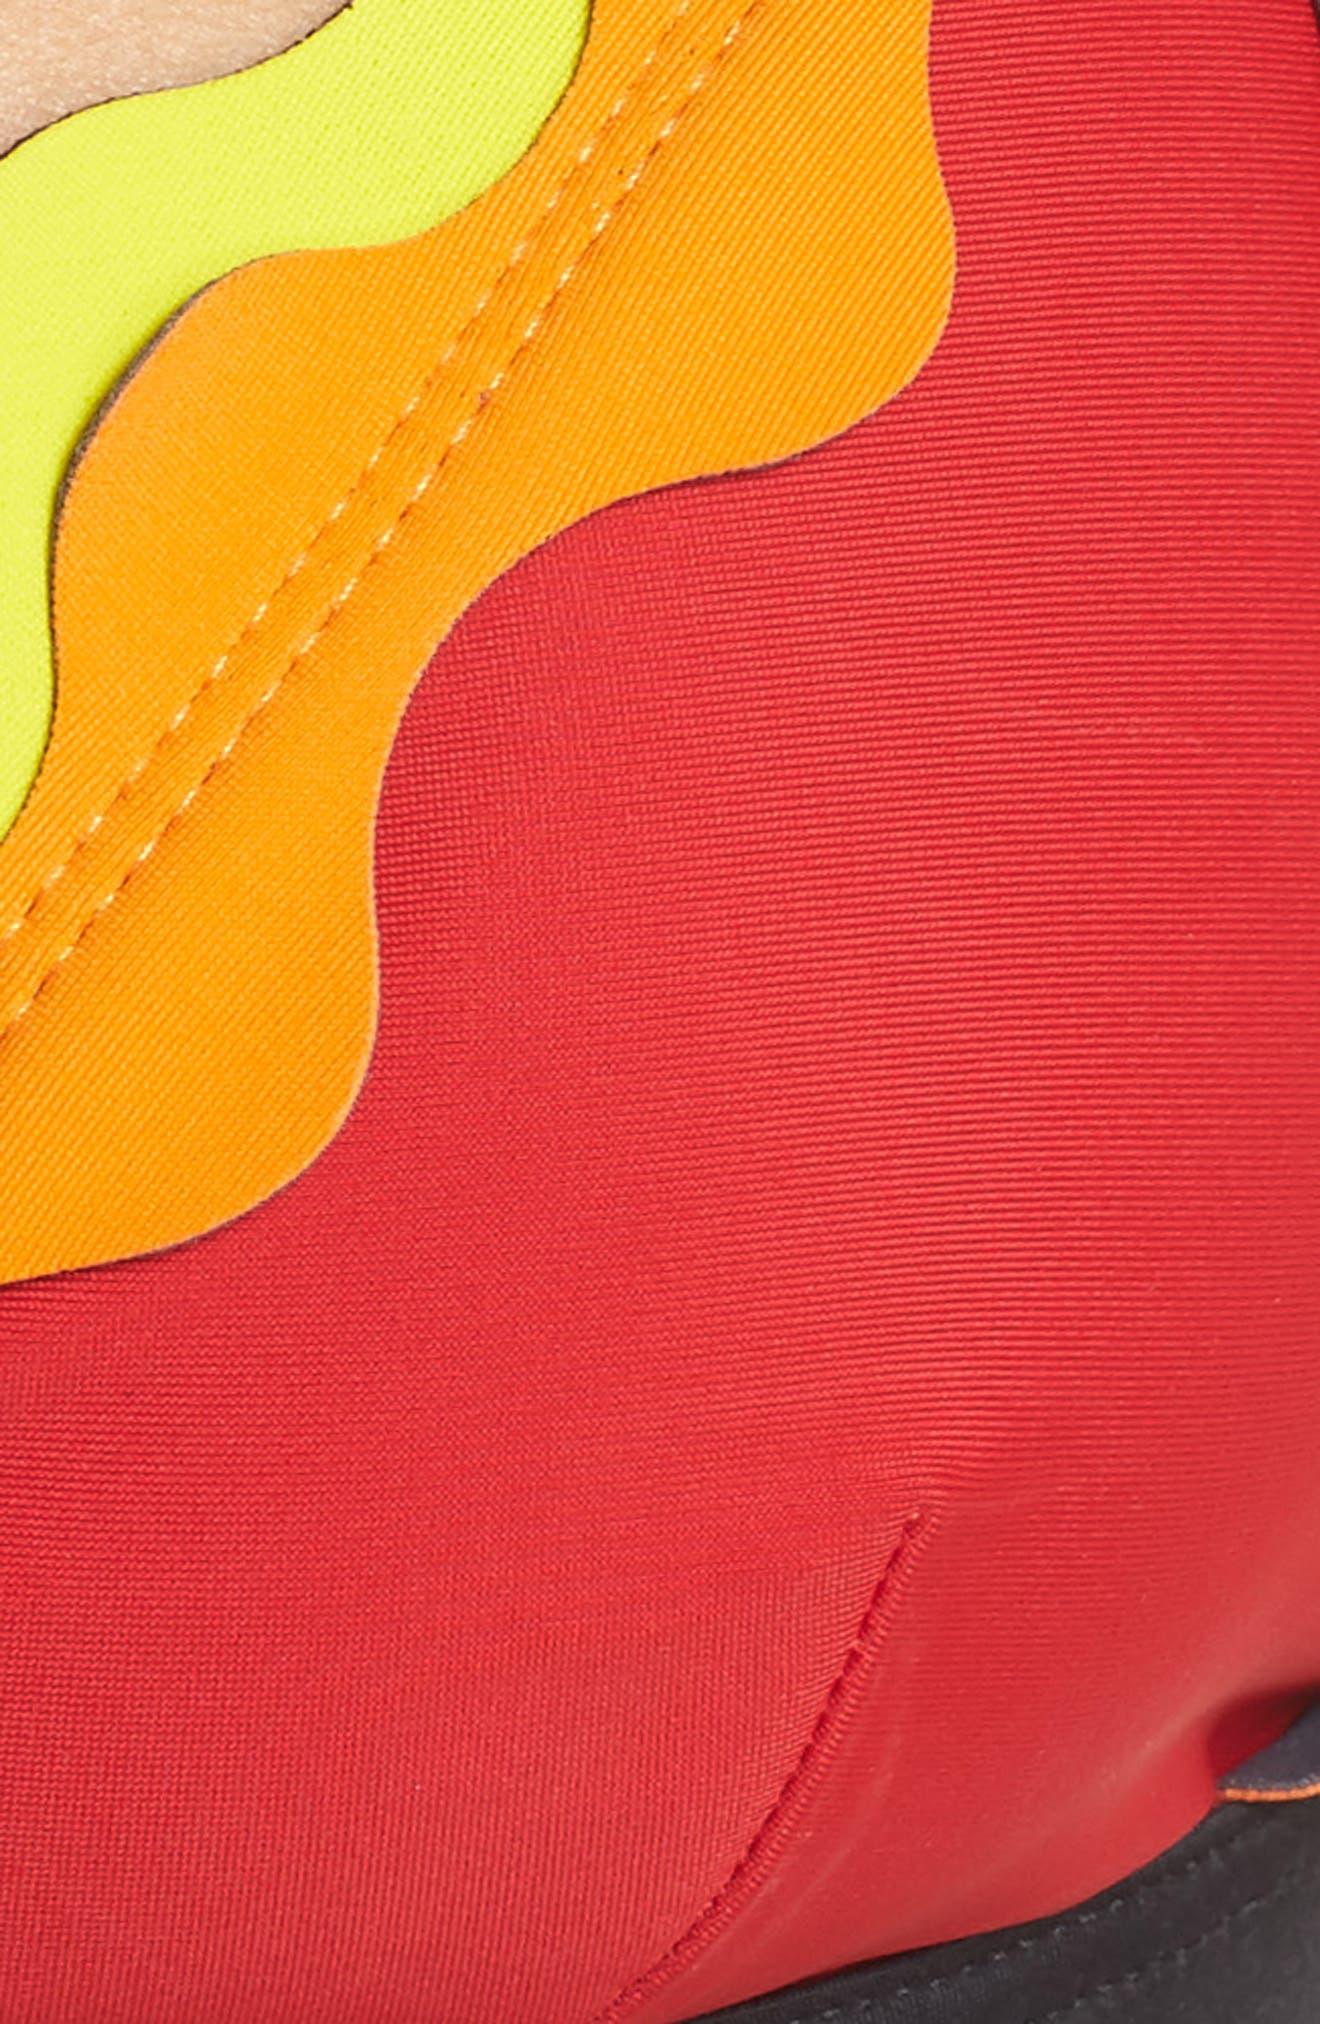 Cackle Scallop Bikini Top,                             Alternate thumbnail 6, color,